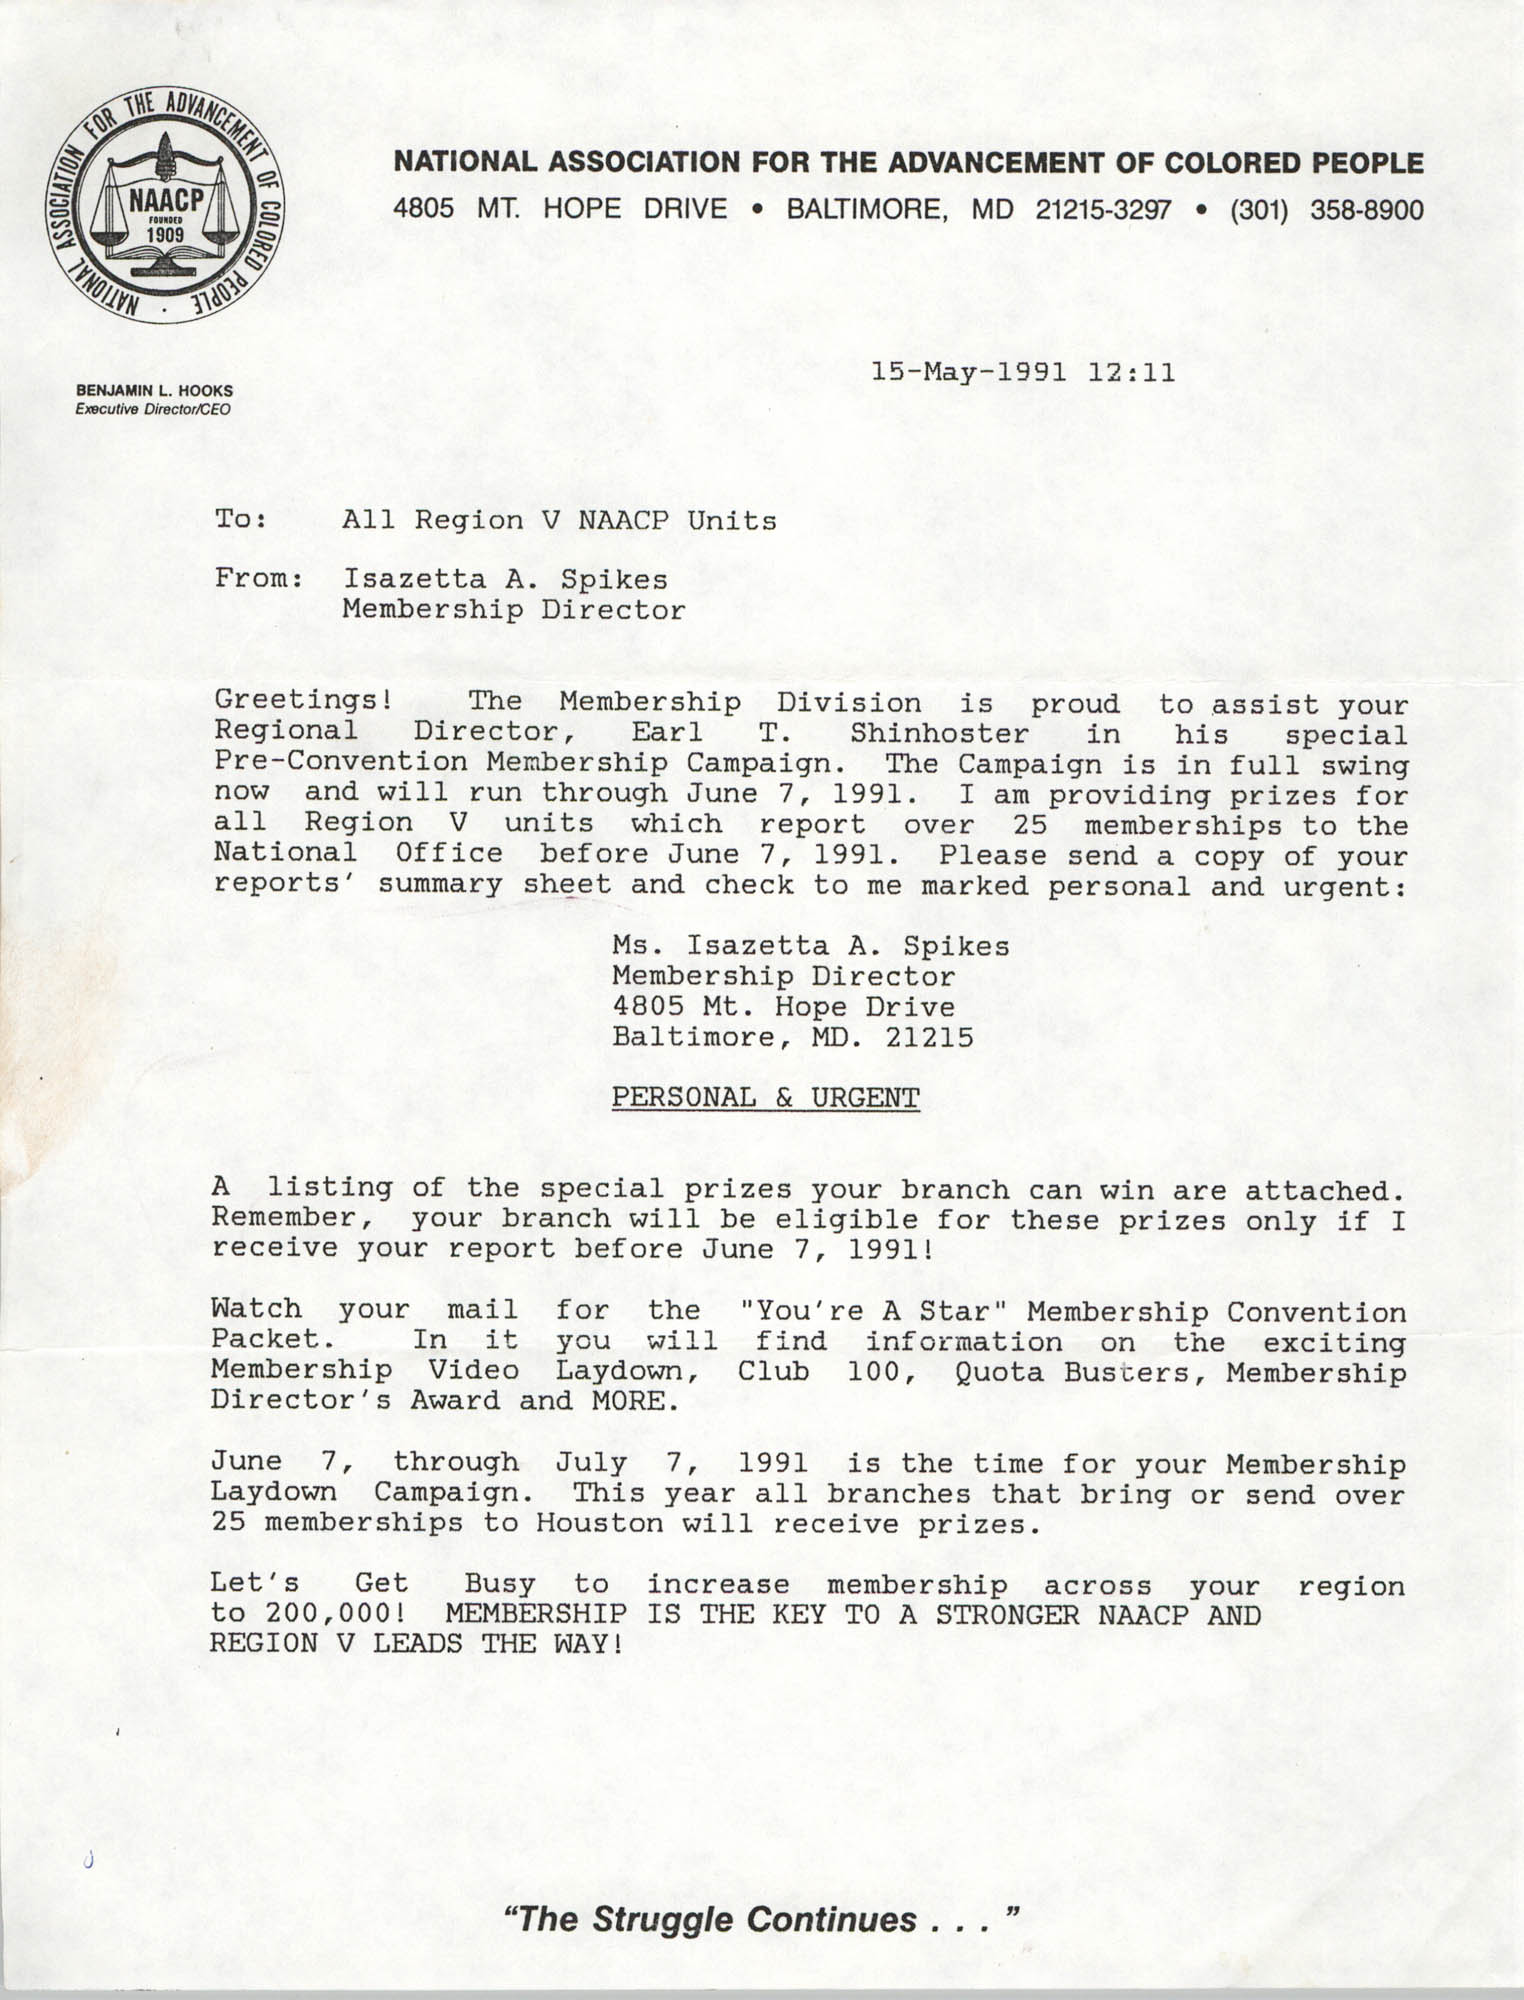 Memorandum, Isazetta A. Spikes, May 15, 1991